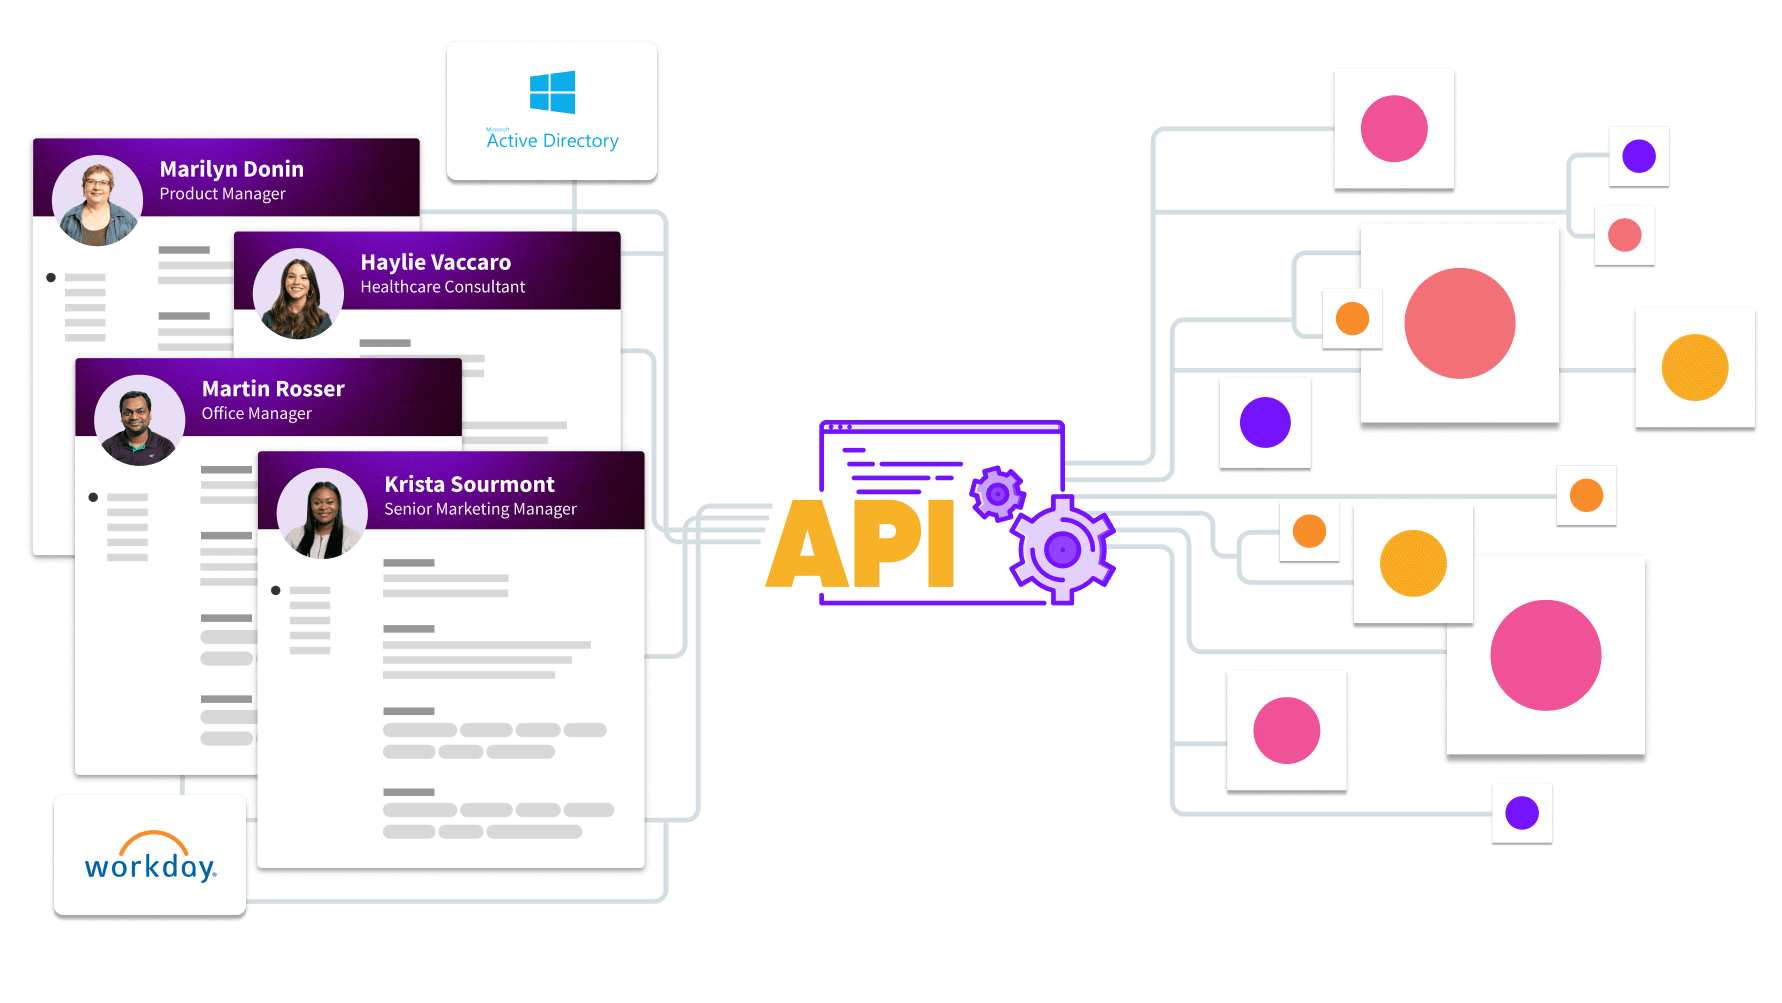 Access profile information via Sift's API